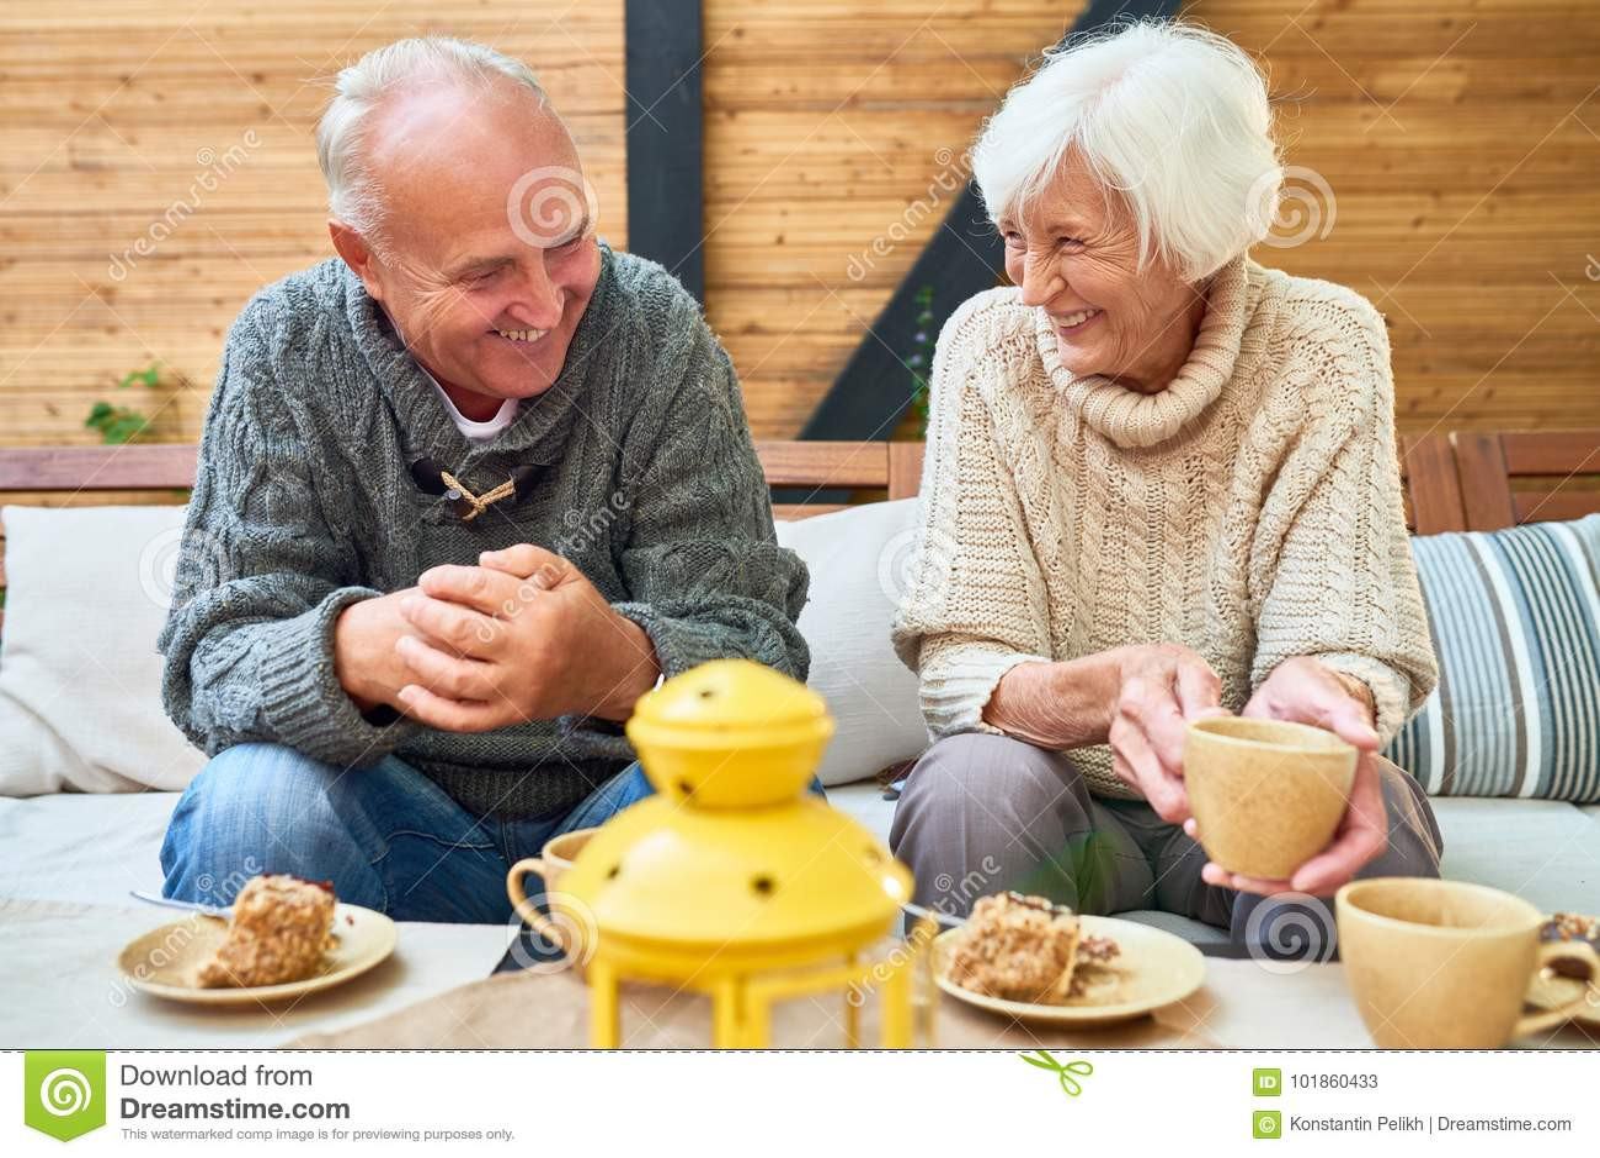 Gelukkig Hoger Paar in Pensionering